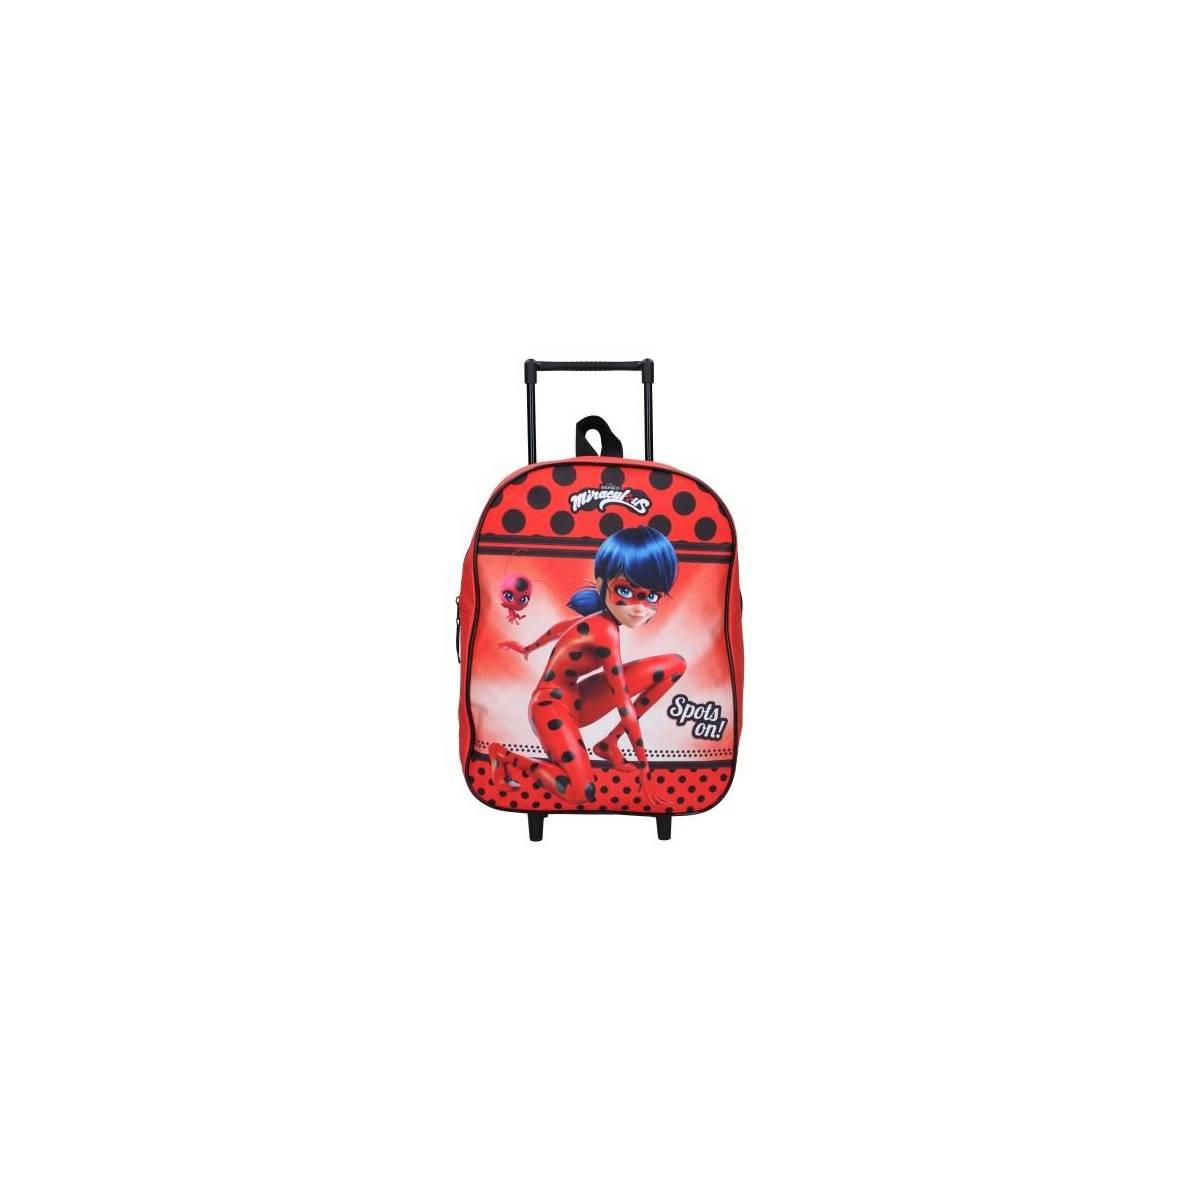 Miraculous Voilà Ladybug wheeled backpack 35 cm